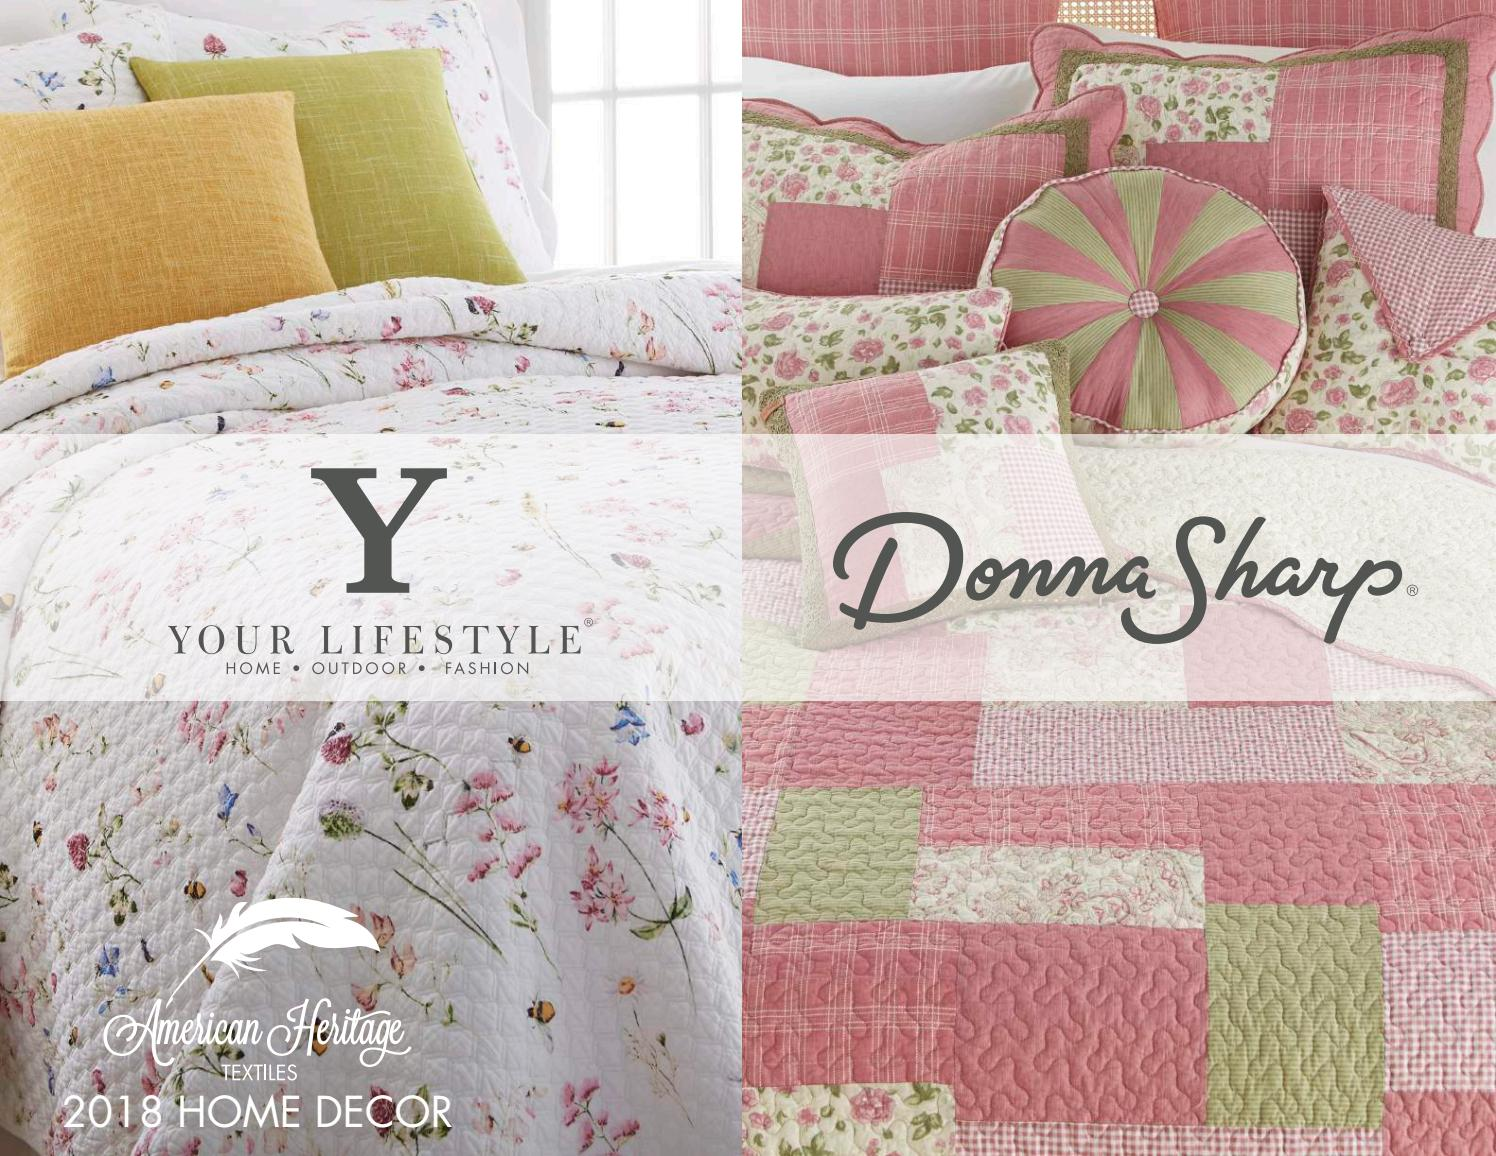 Donna Sharp Lavender Rose Decorative Pillow 16 x 16 White//Green